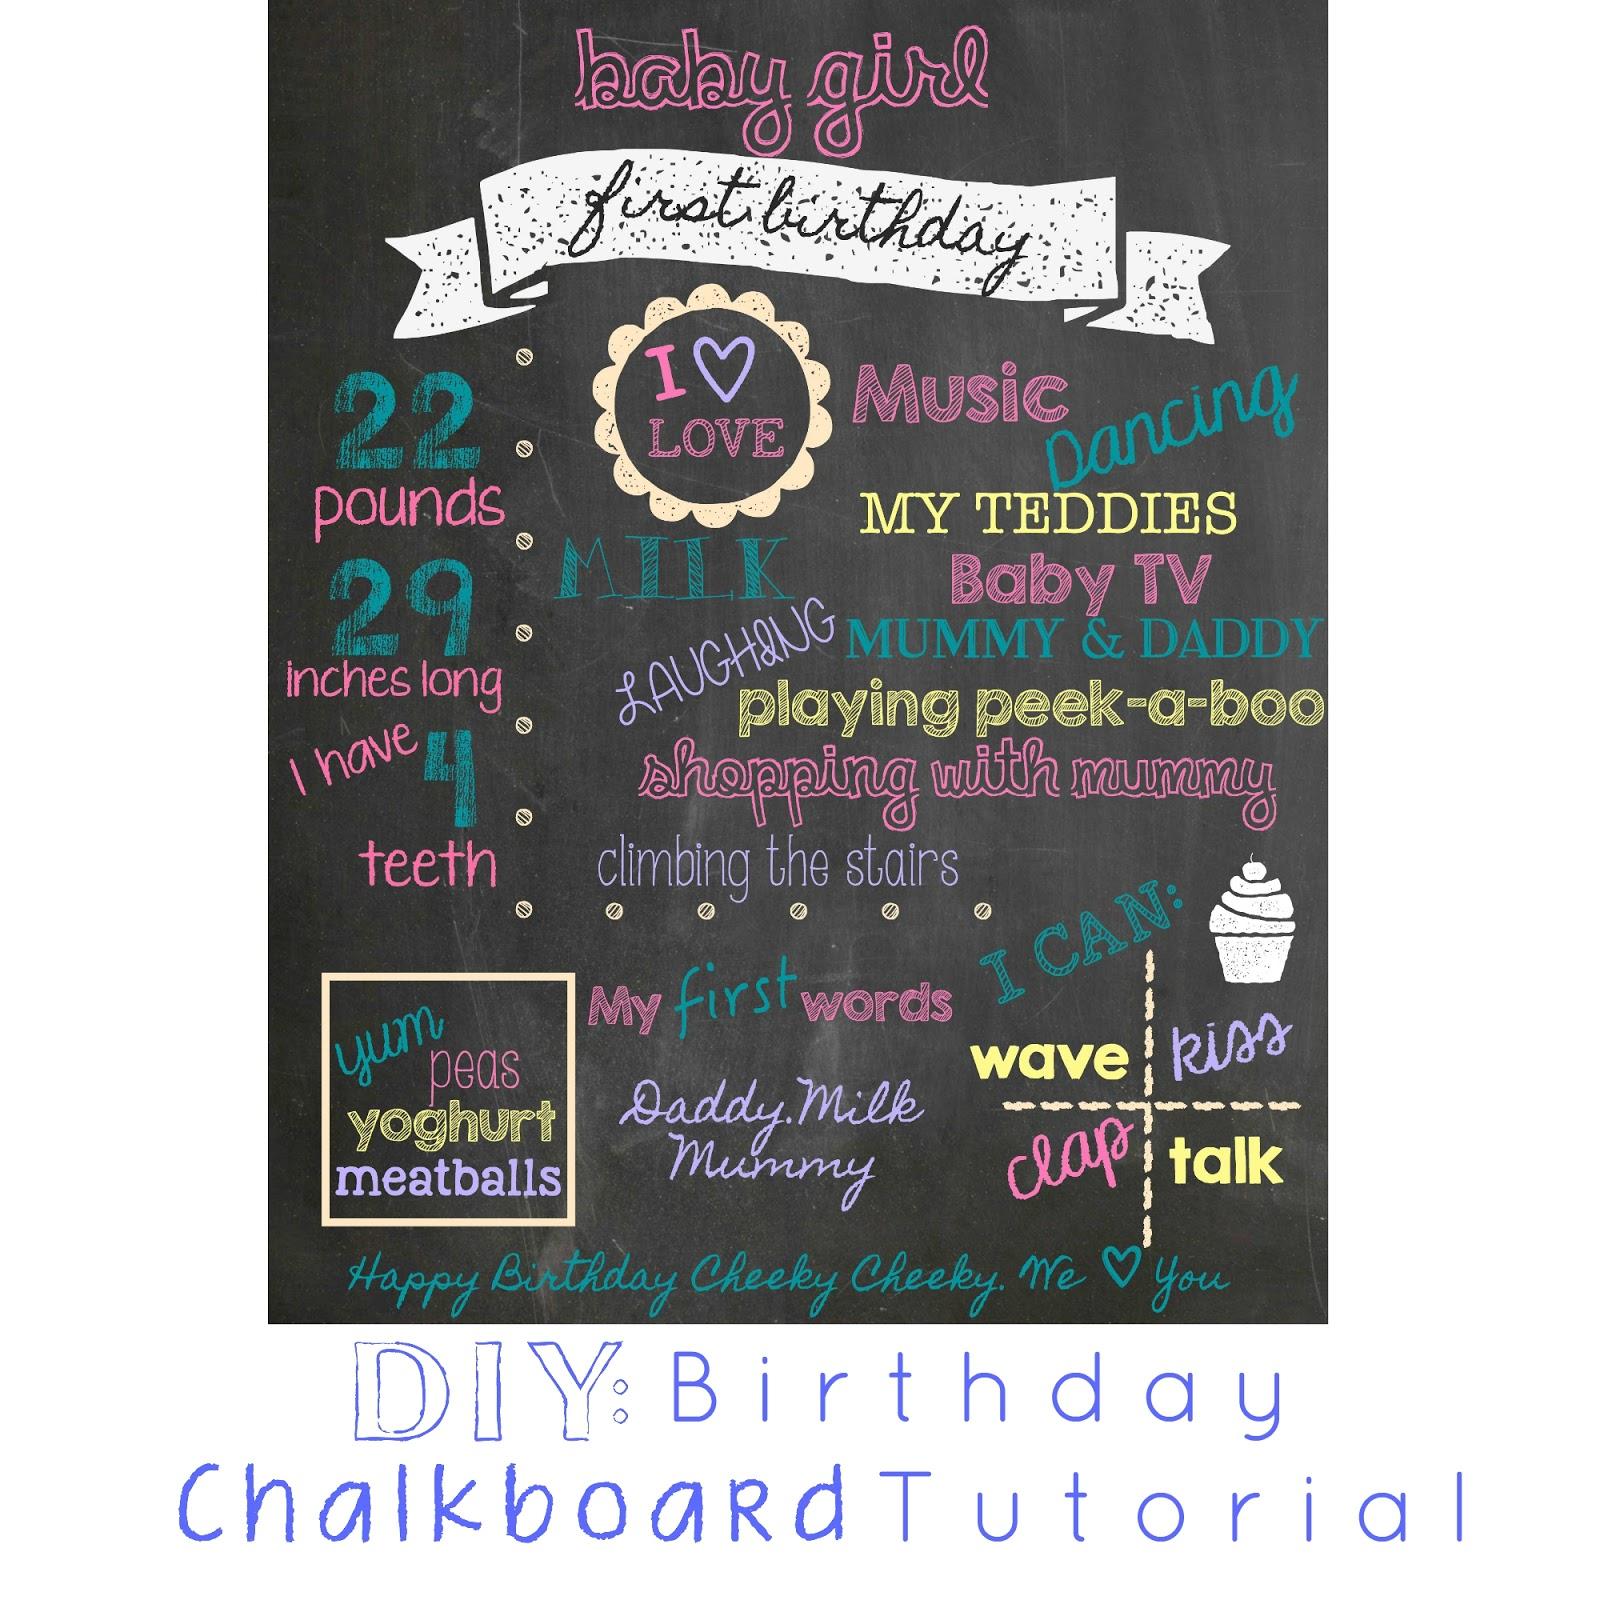 DIY Birthday Chalkboard Tutorial Eat Love Live